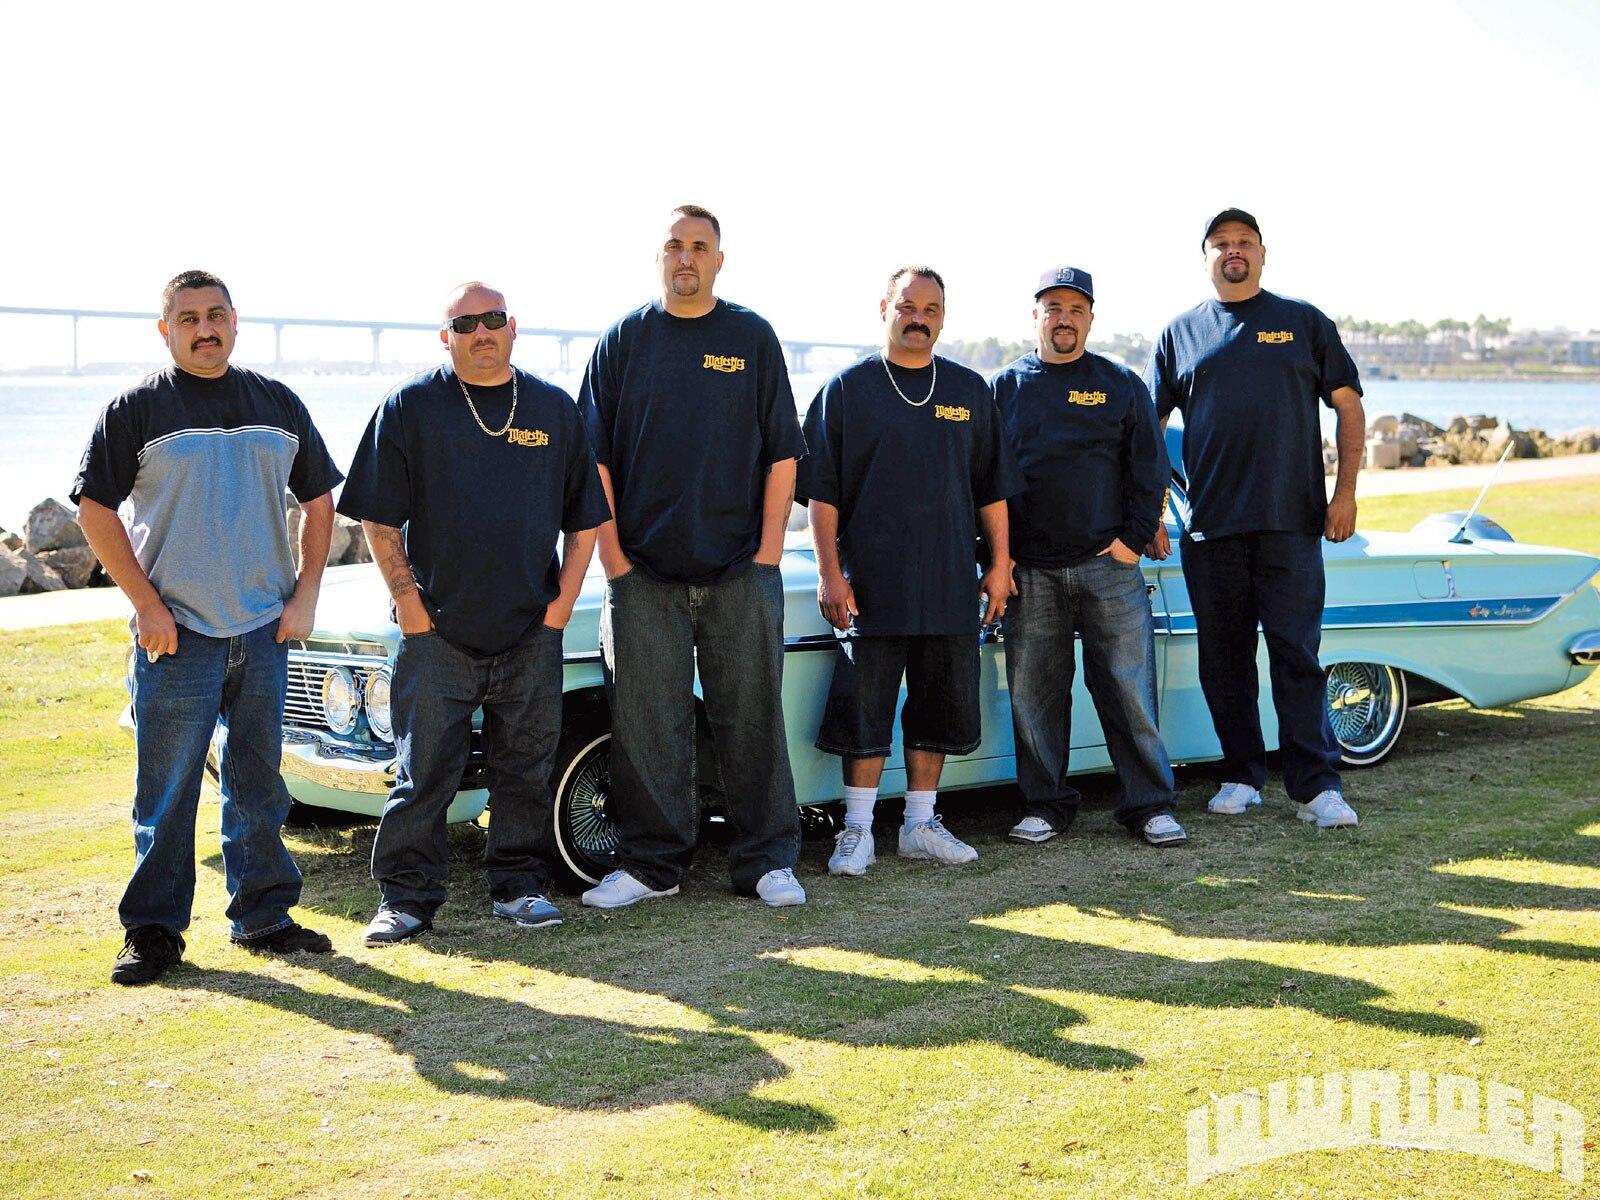 Lrmp O Rob Bird Rice Majestics Car Club San Diego The Crew